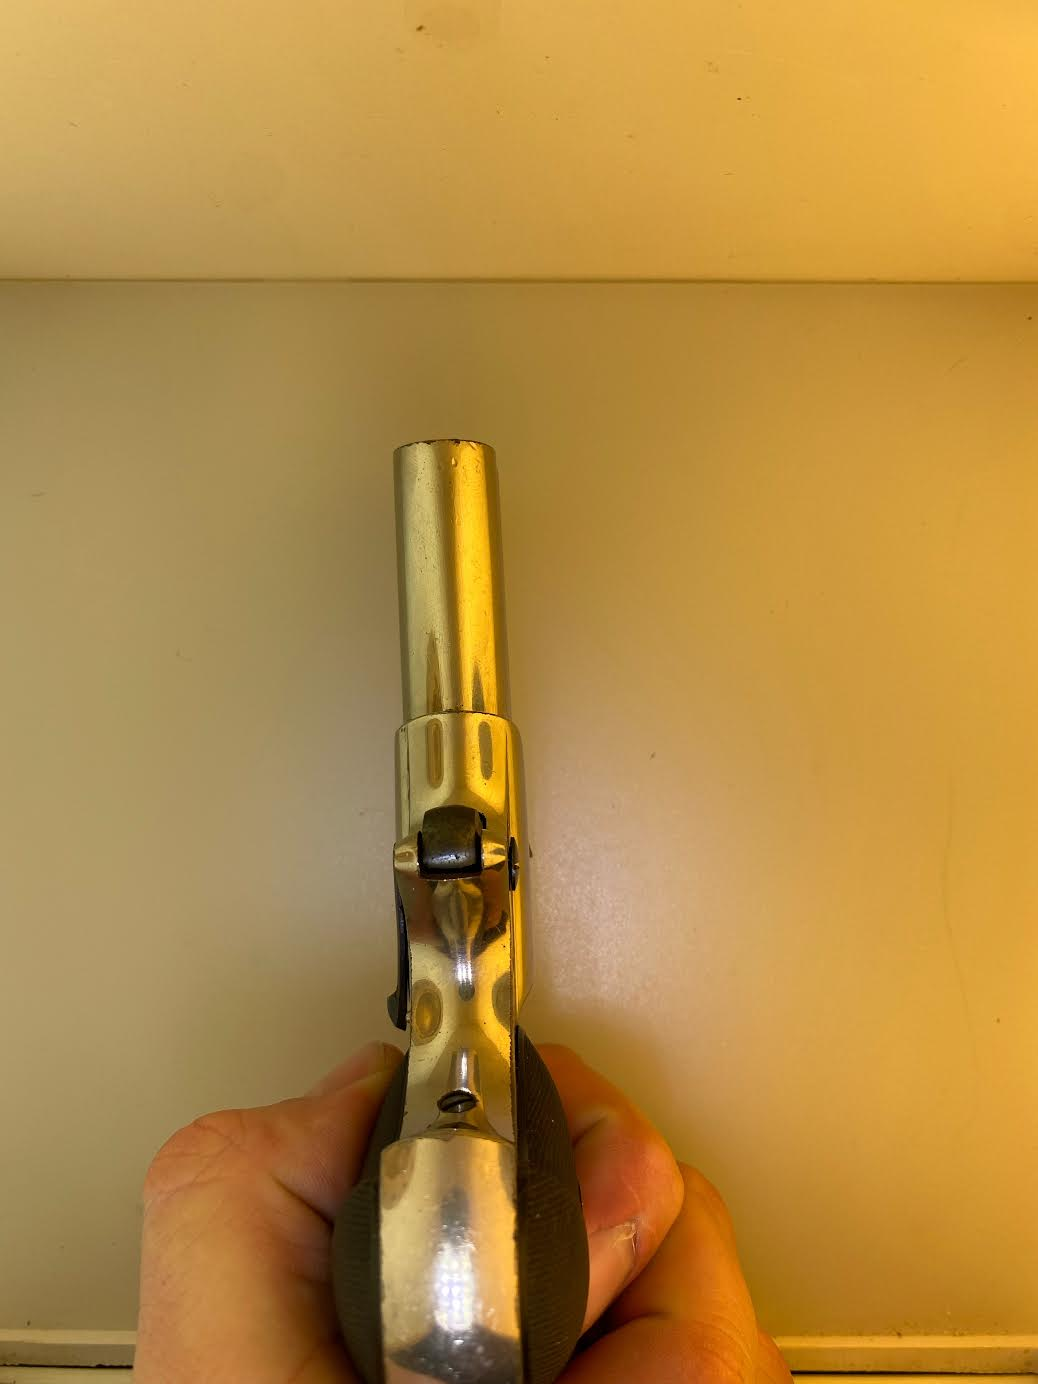 REMINGTON ARMS COMPANY, INC. Model 95